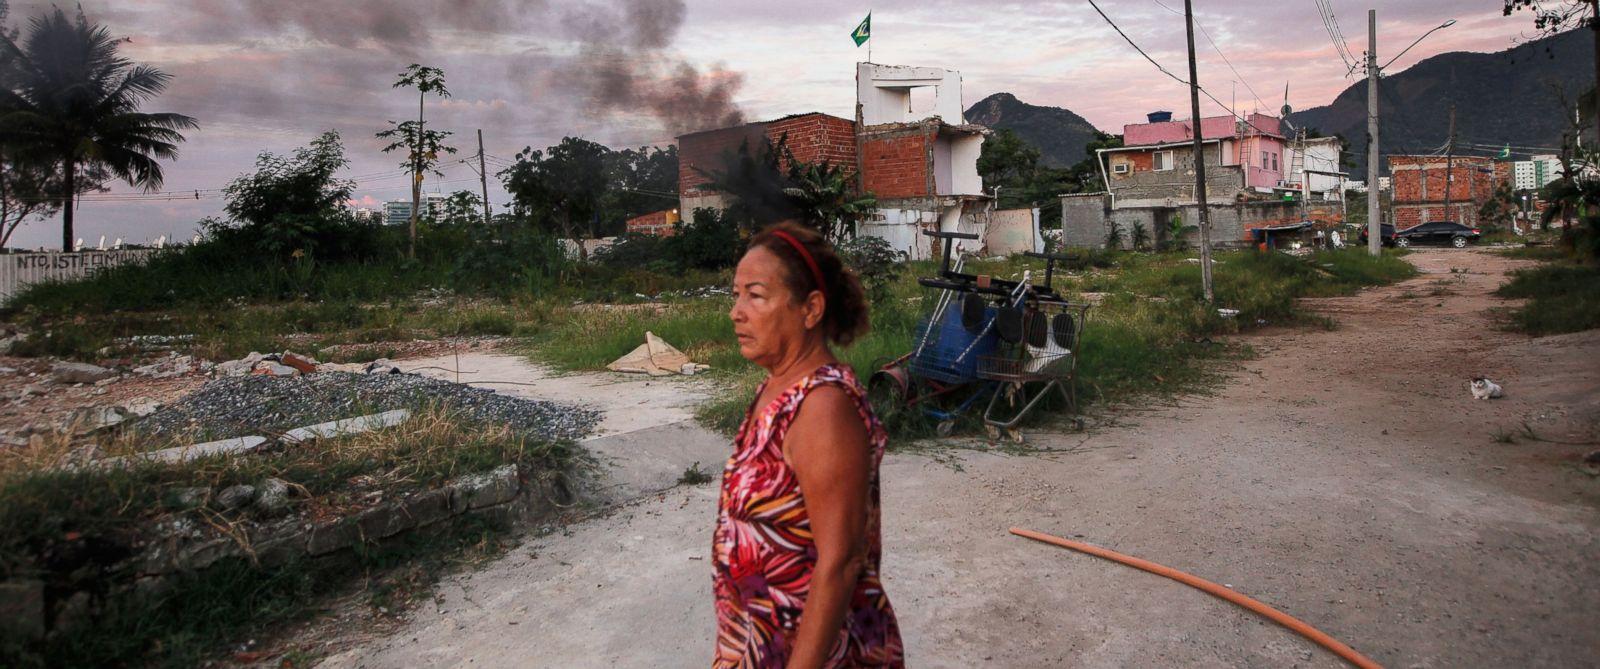 PHOTO:Marize do Amor Divino, who said she was diagnosed with the Zika virus, walks in the mostly demolished Vila Autodromo favela community, Feb. 25, 2016, in Rio de Janeiro.